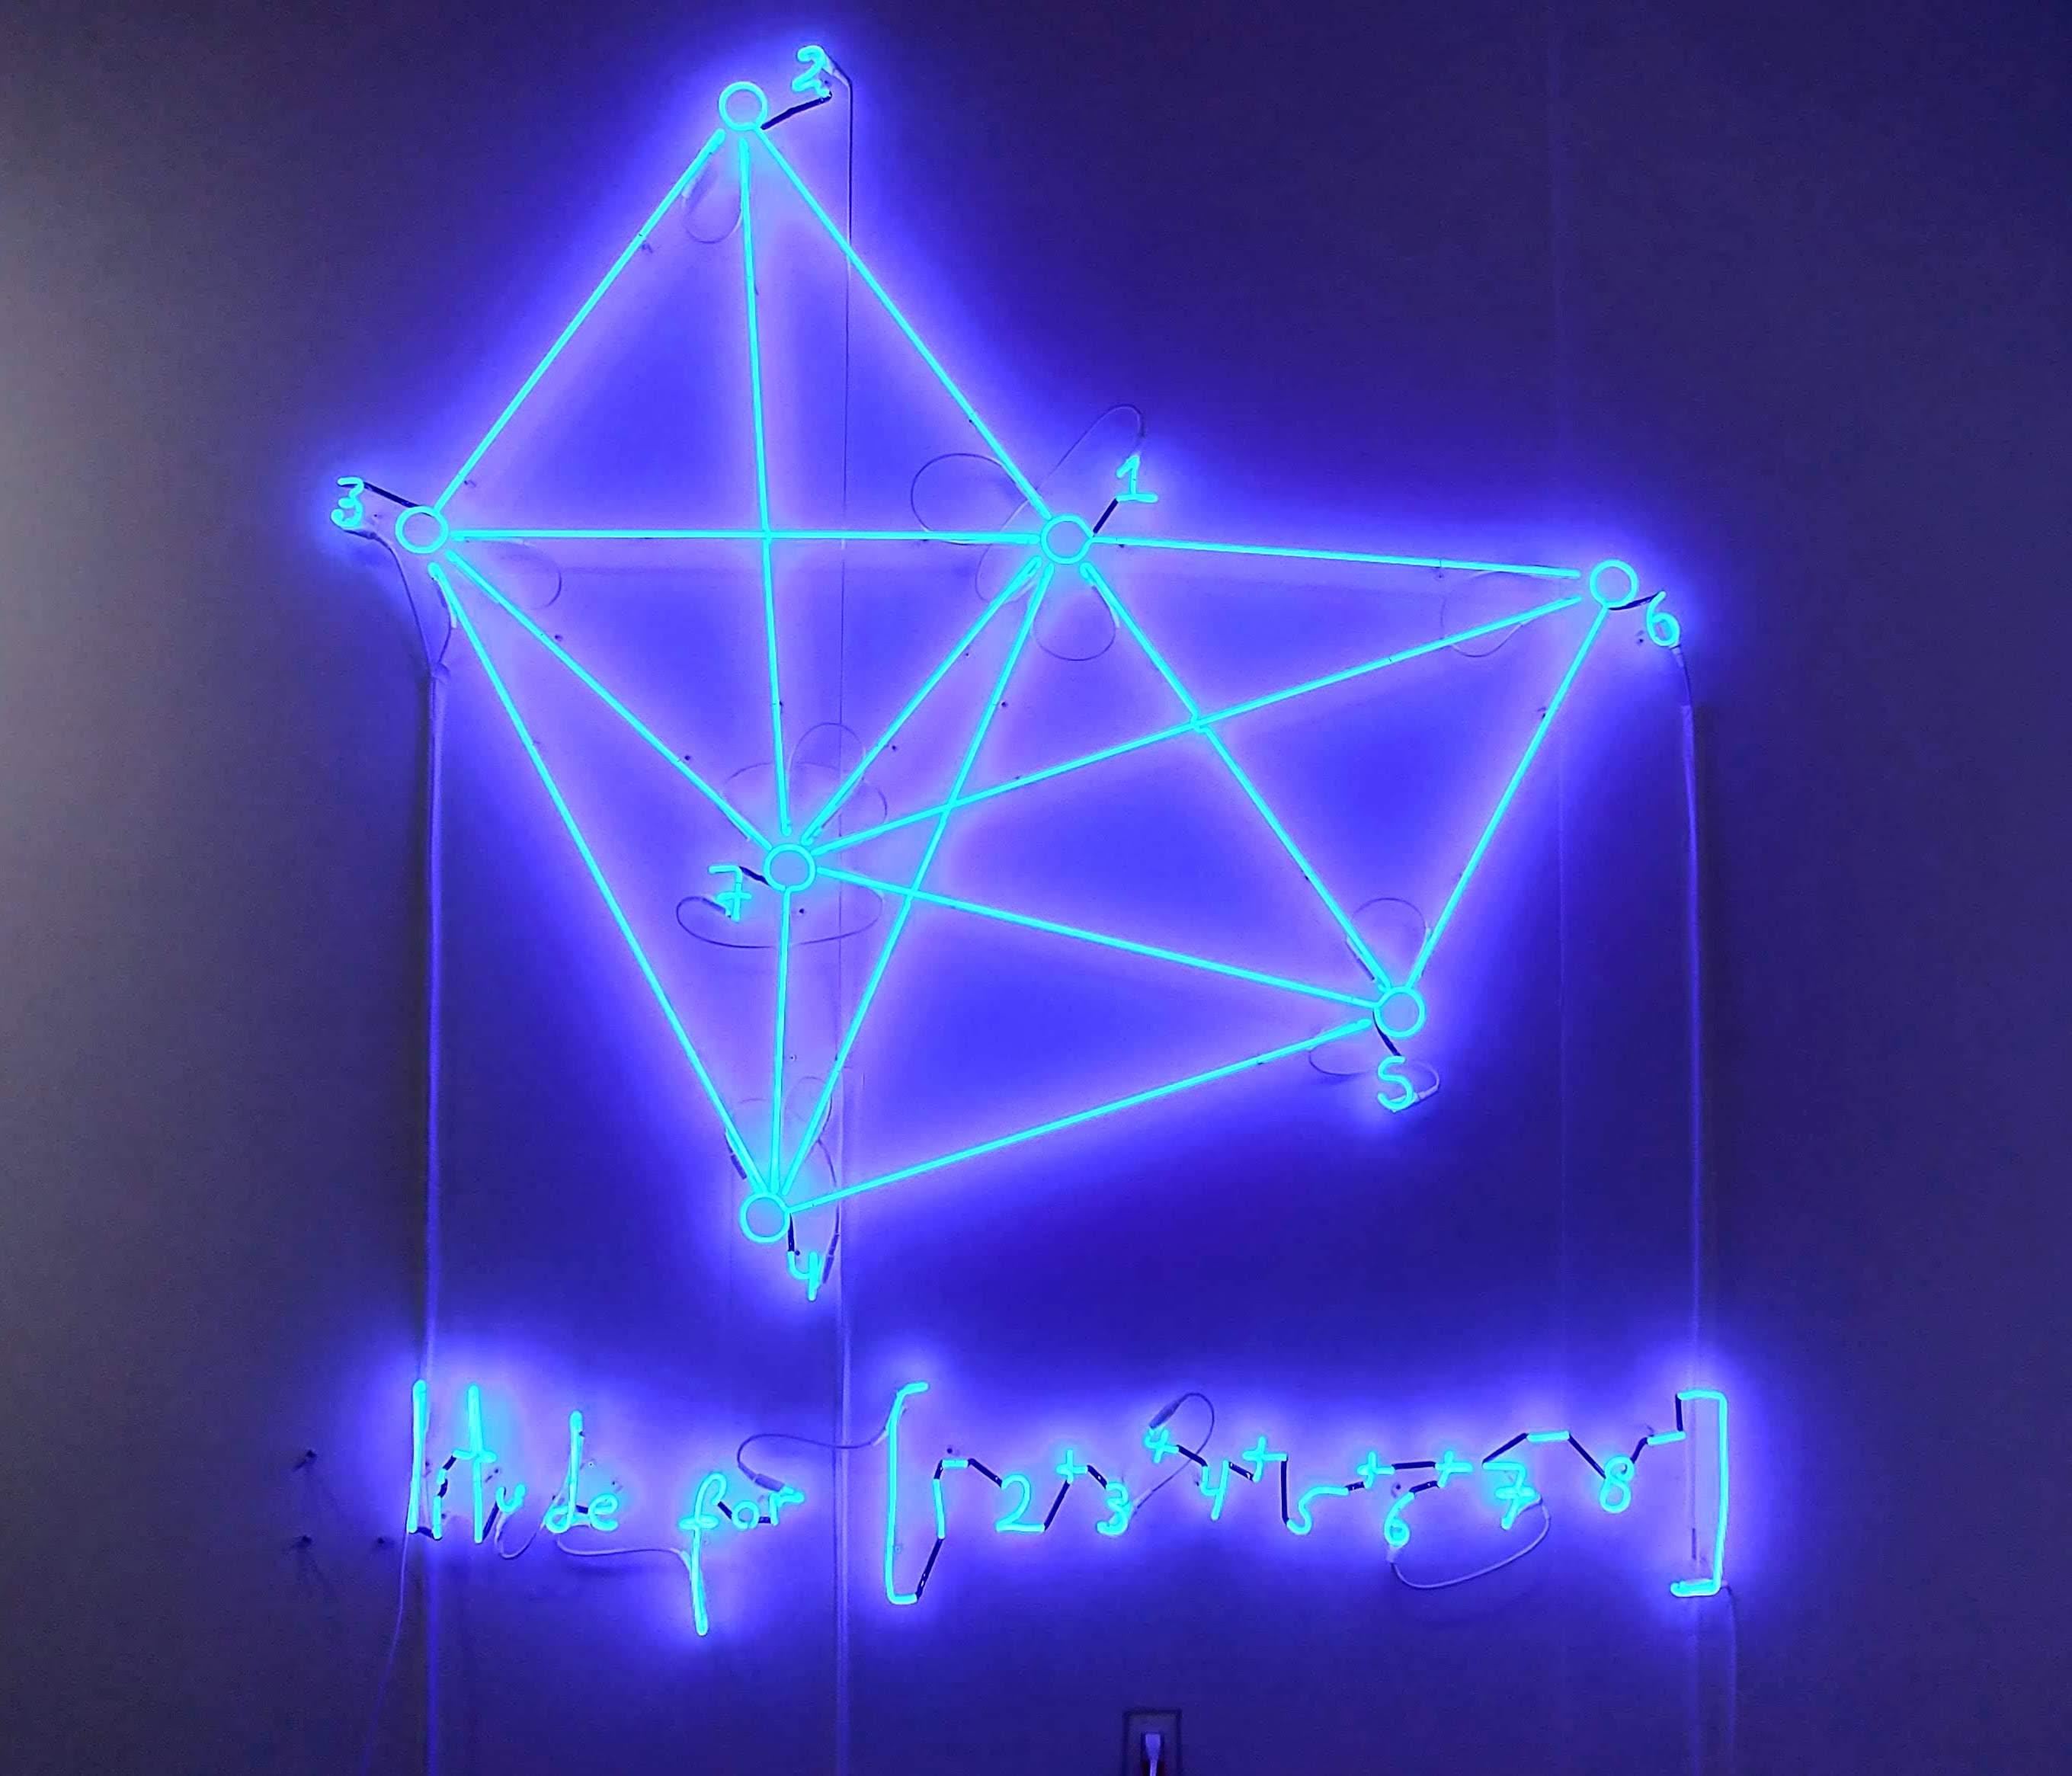 Study on Amplituhedron, 2017 ©Andrea Galvani.